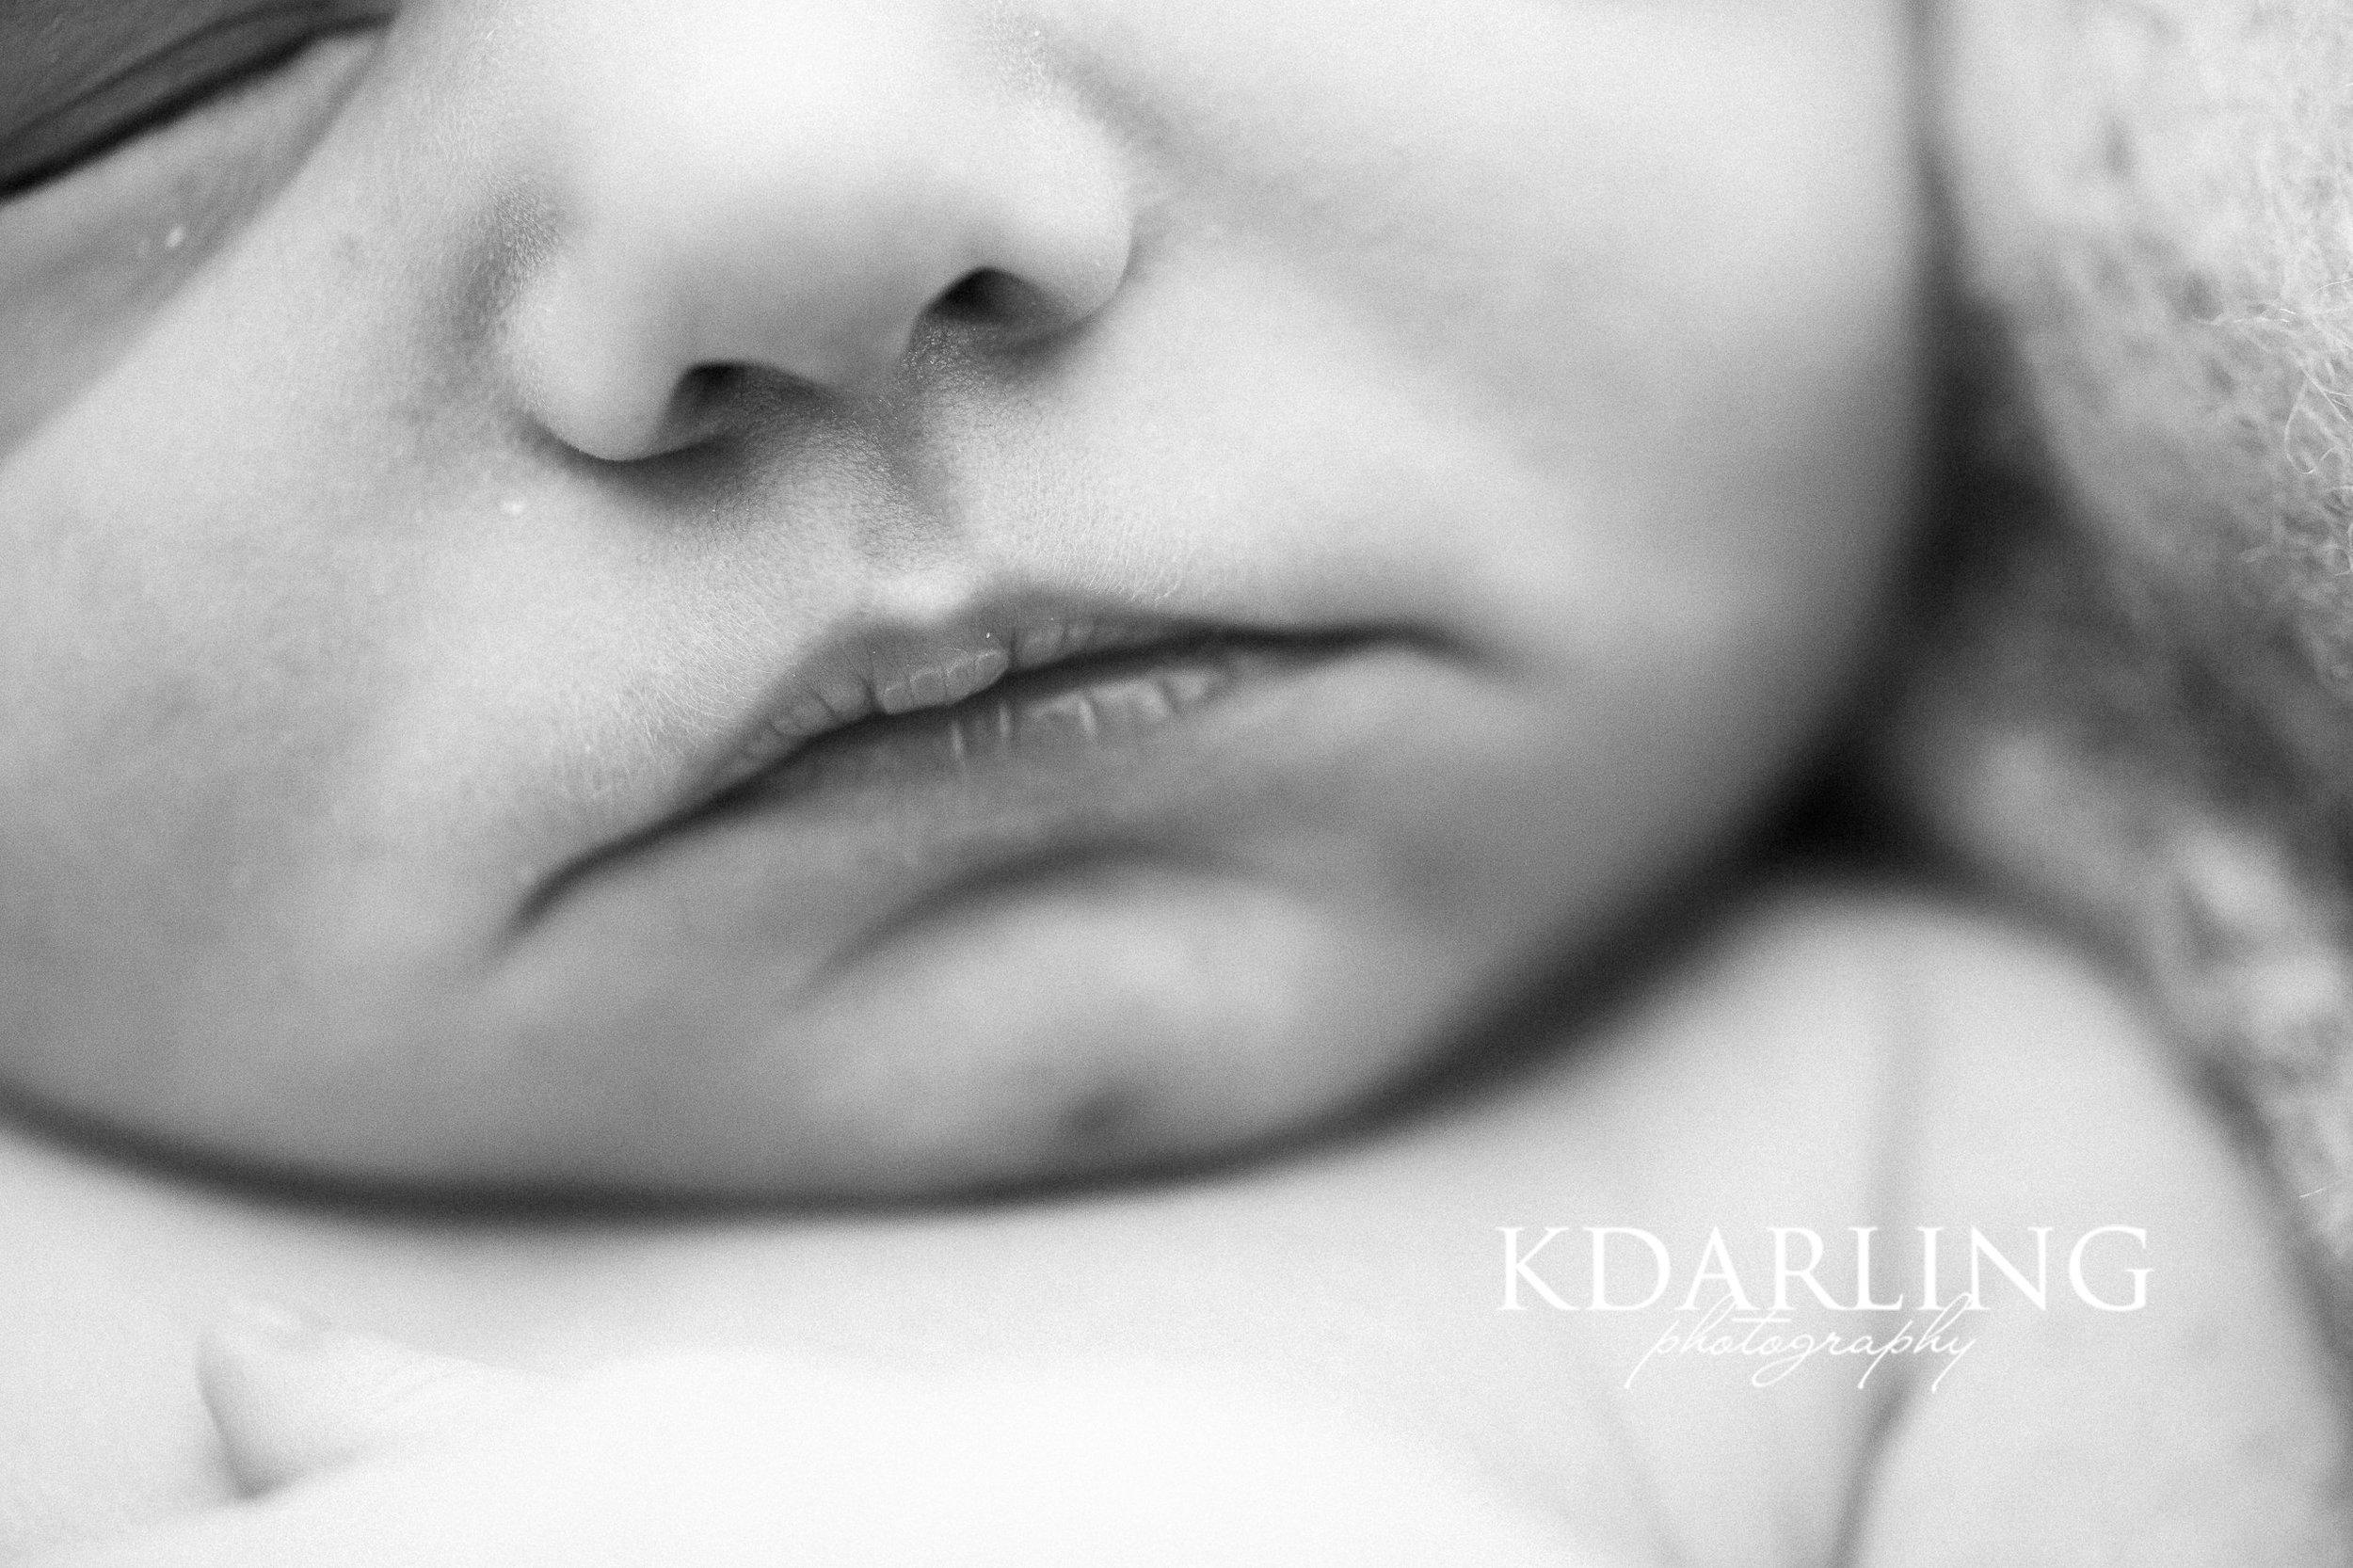 newborn-girl-neutral-organic-sleeping-champaign-il-county-photographer-darling_0336